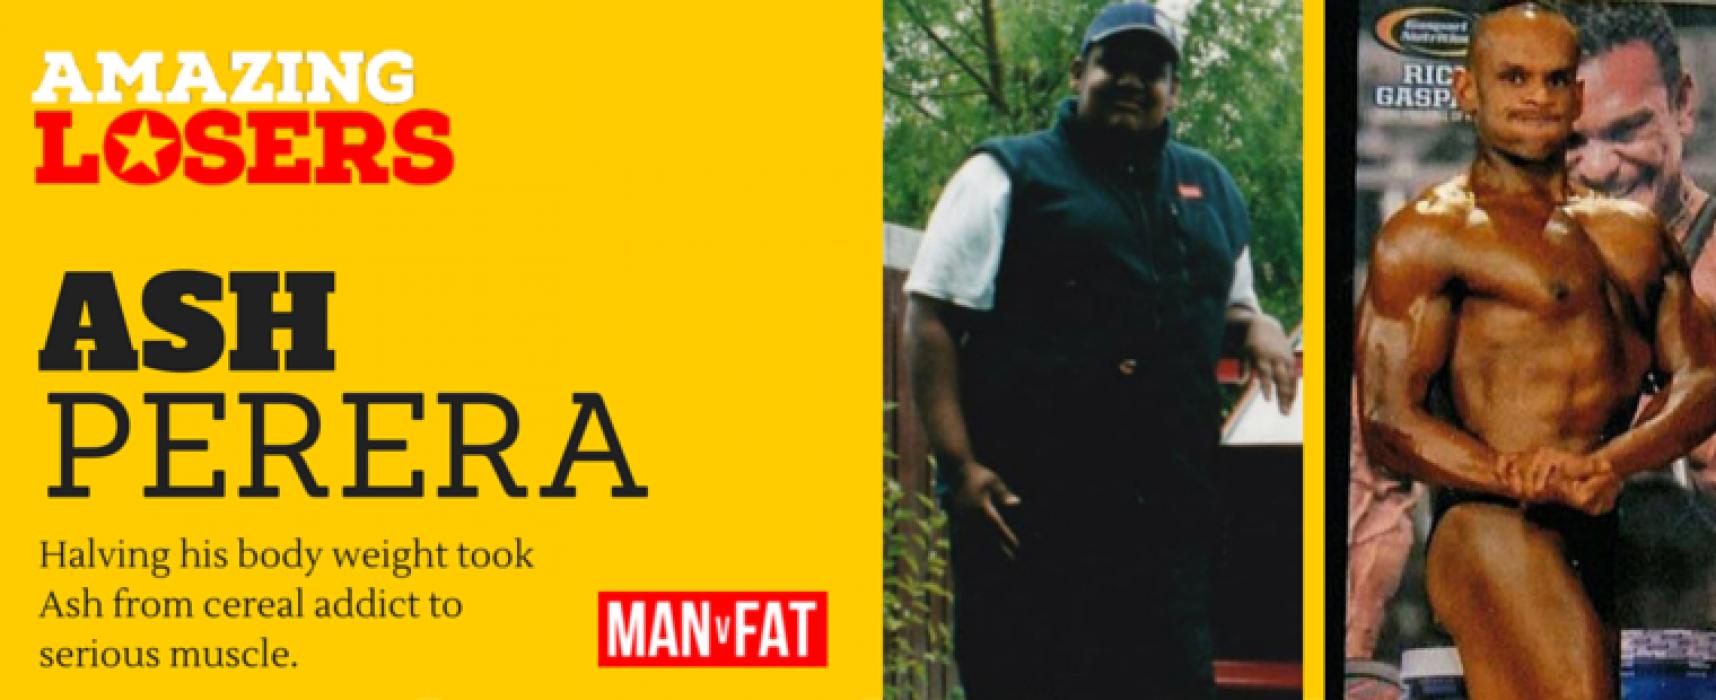 Amazing Loser – Ash Perera – Weight Loss Stories